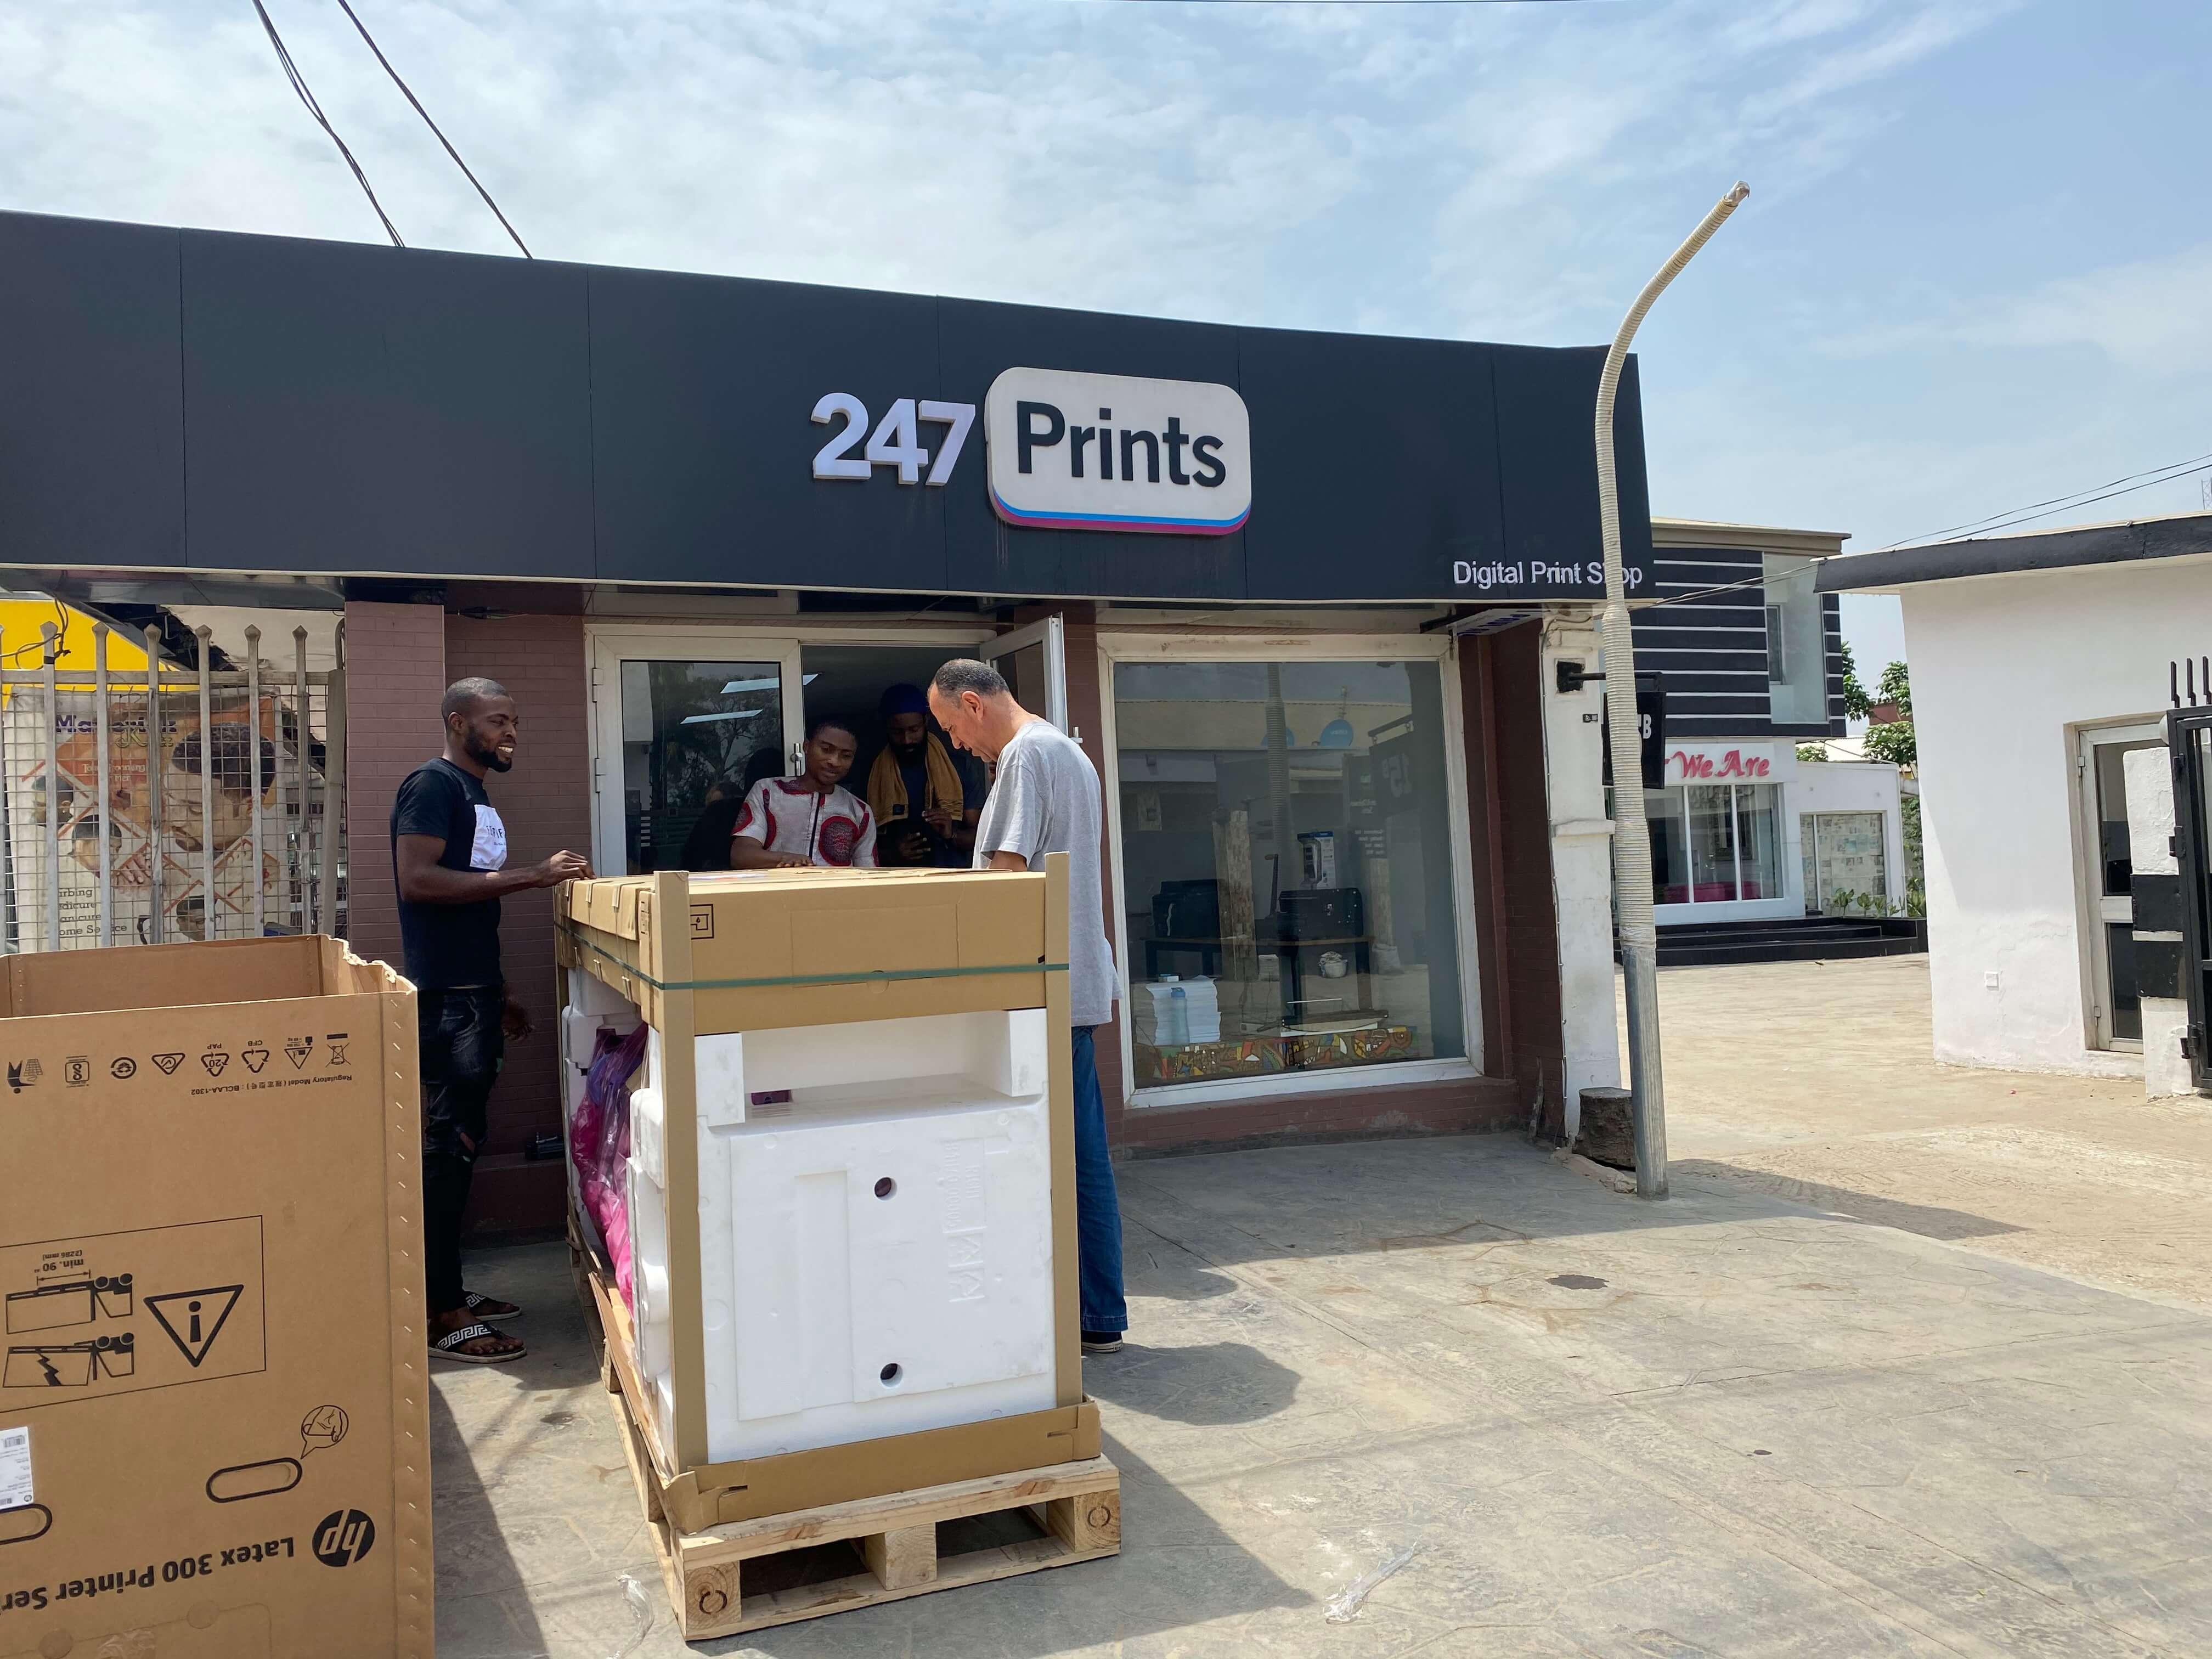 Ark 247 Prints installs Hp Latex 335 Print and Cut solution.